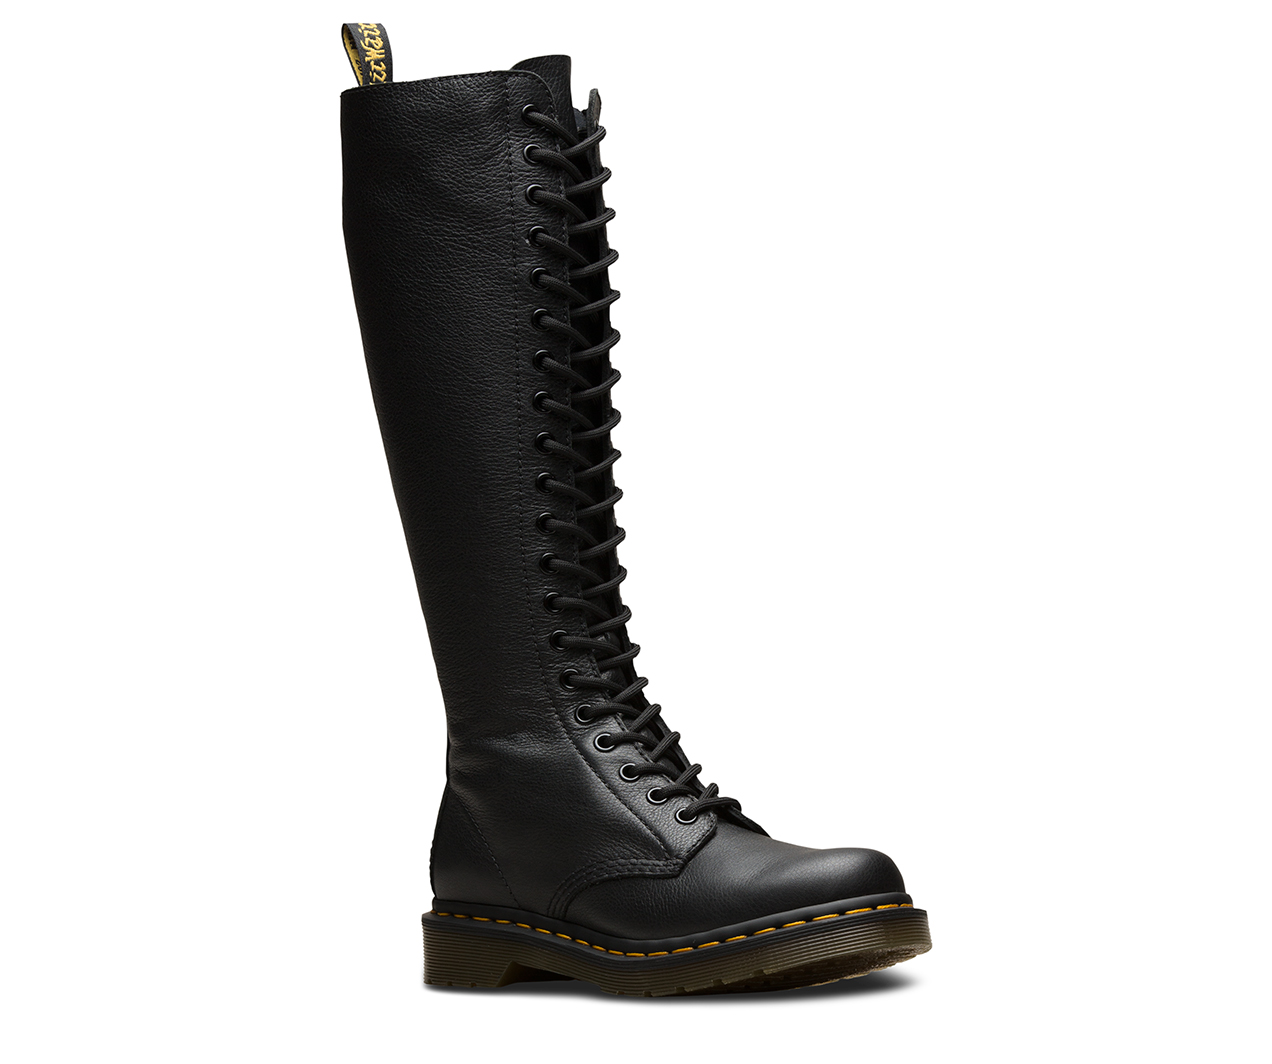 b53486154 1B60   Women's Boots & Shoes   Canada